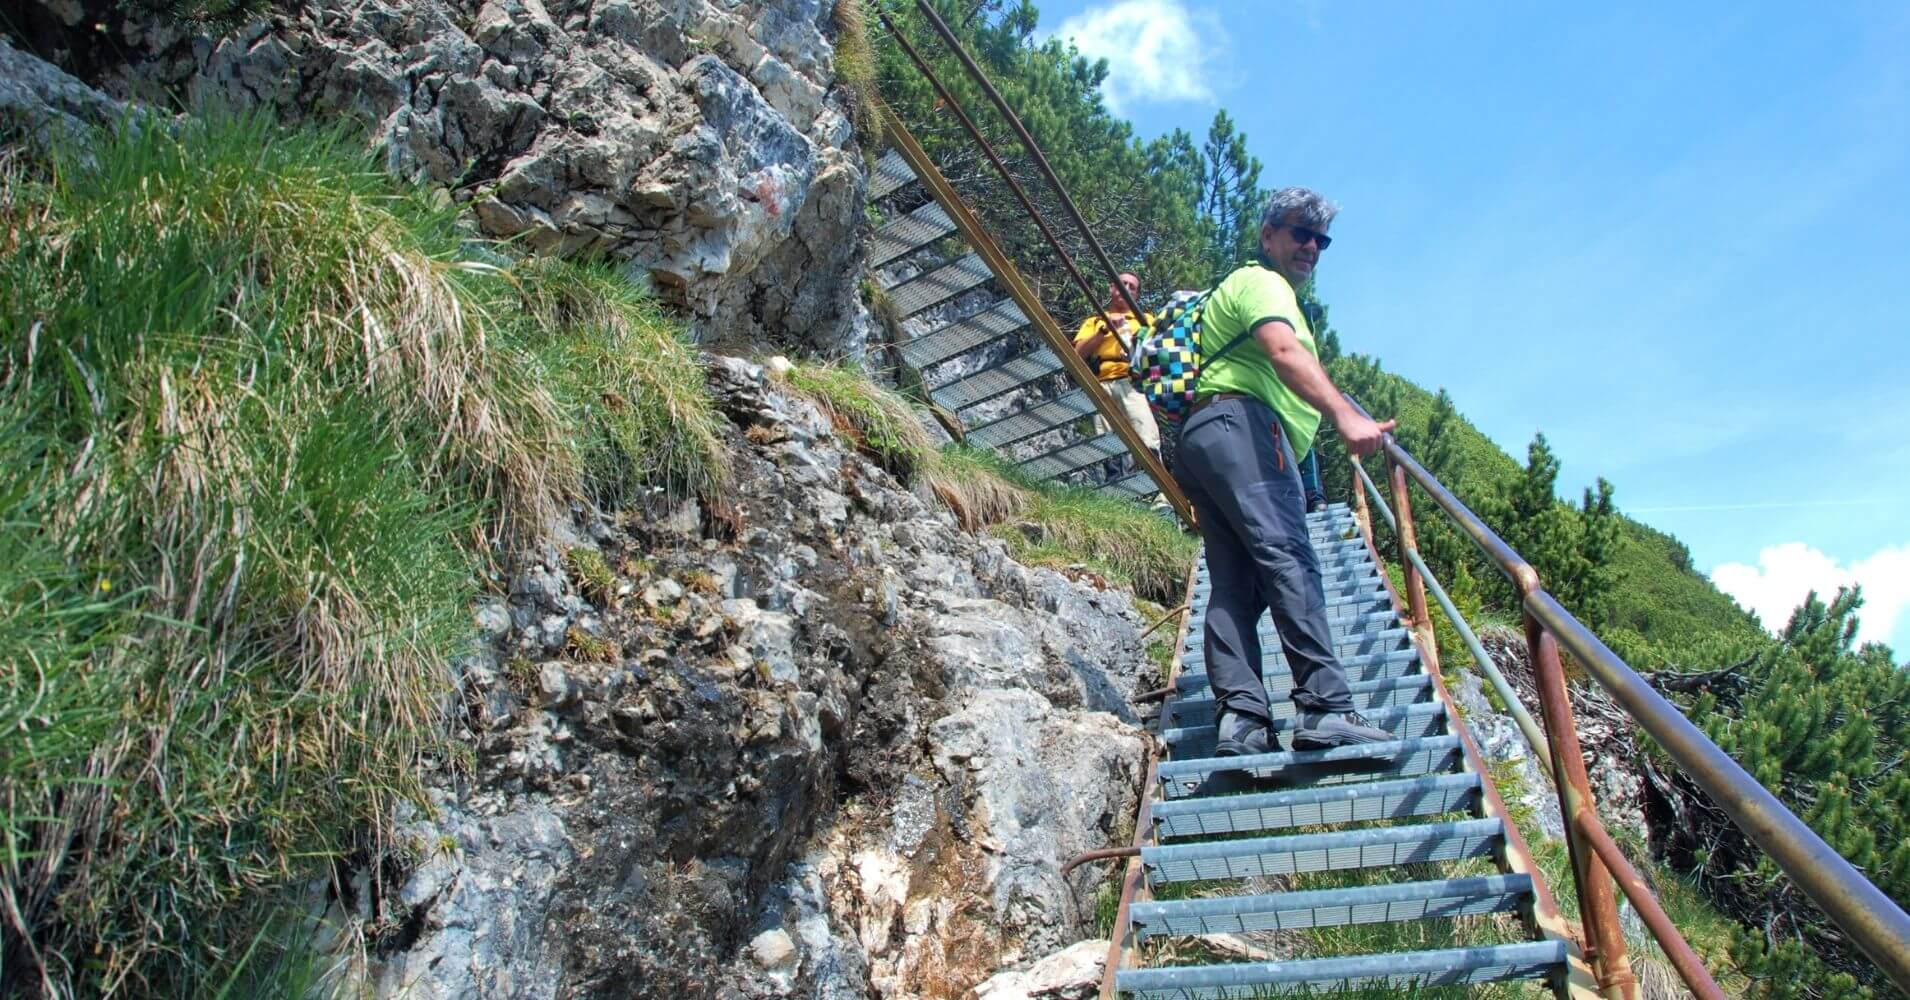 Escaleras del Camino Equipado. Cortina d' Ampezzo. Belluno, Véneto. Italia.